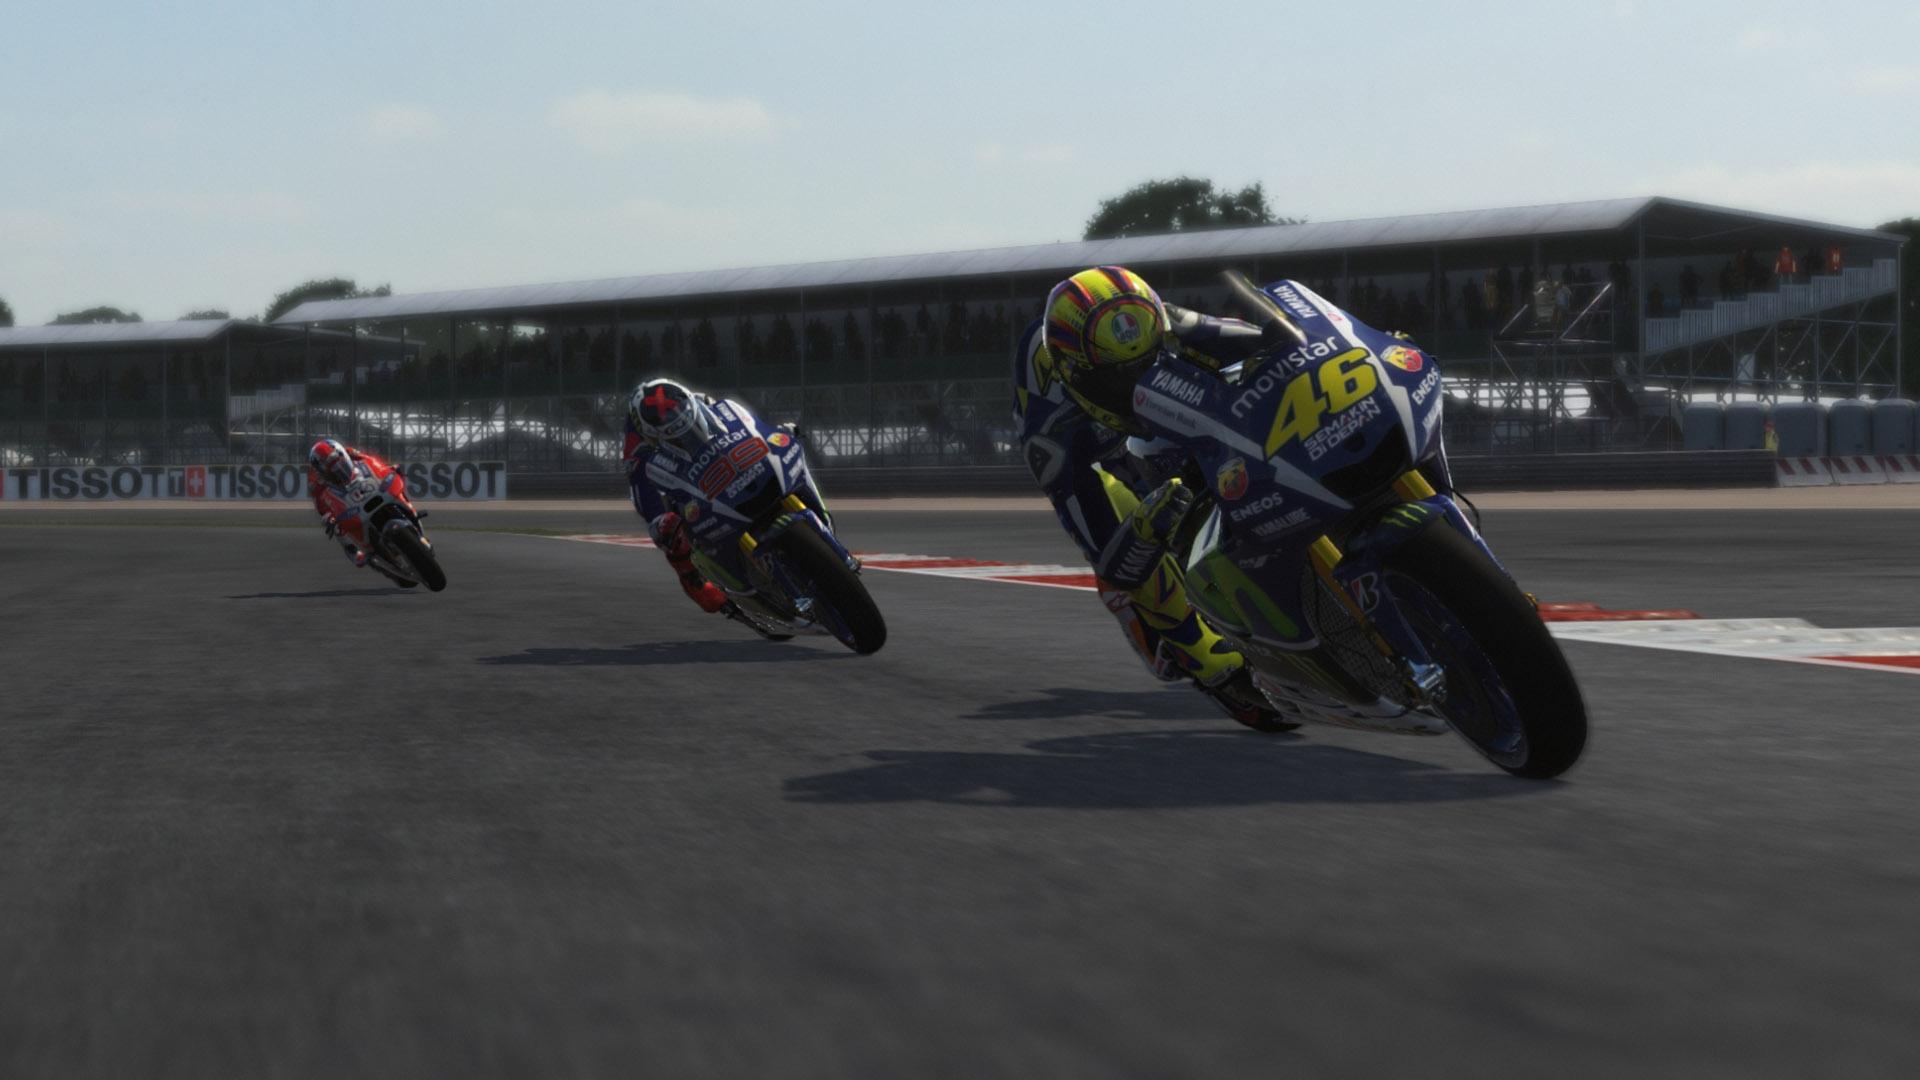 Motogp 2015 Ps4 Novita | MotoGP 2017 Info, Video, Points Table